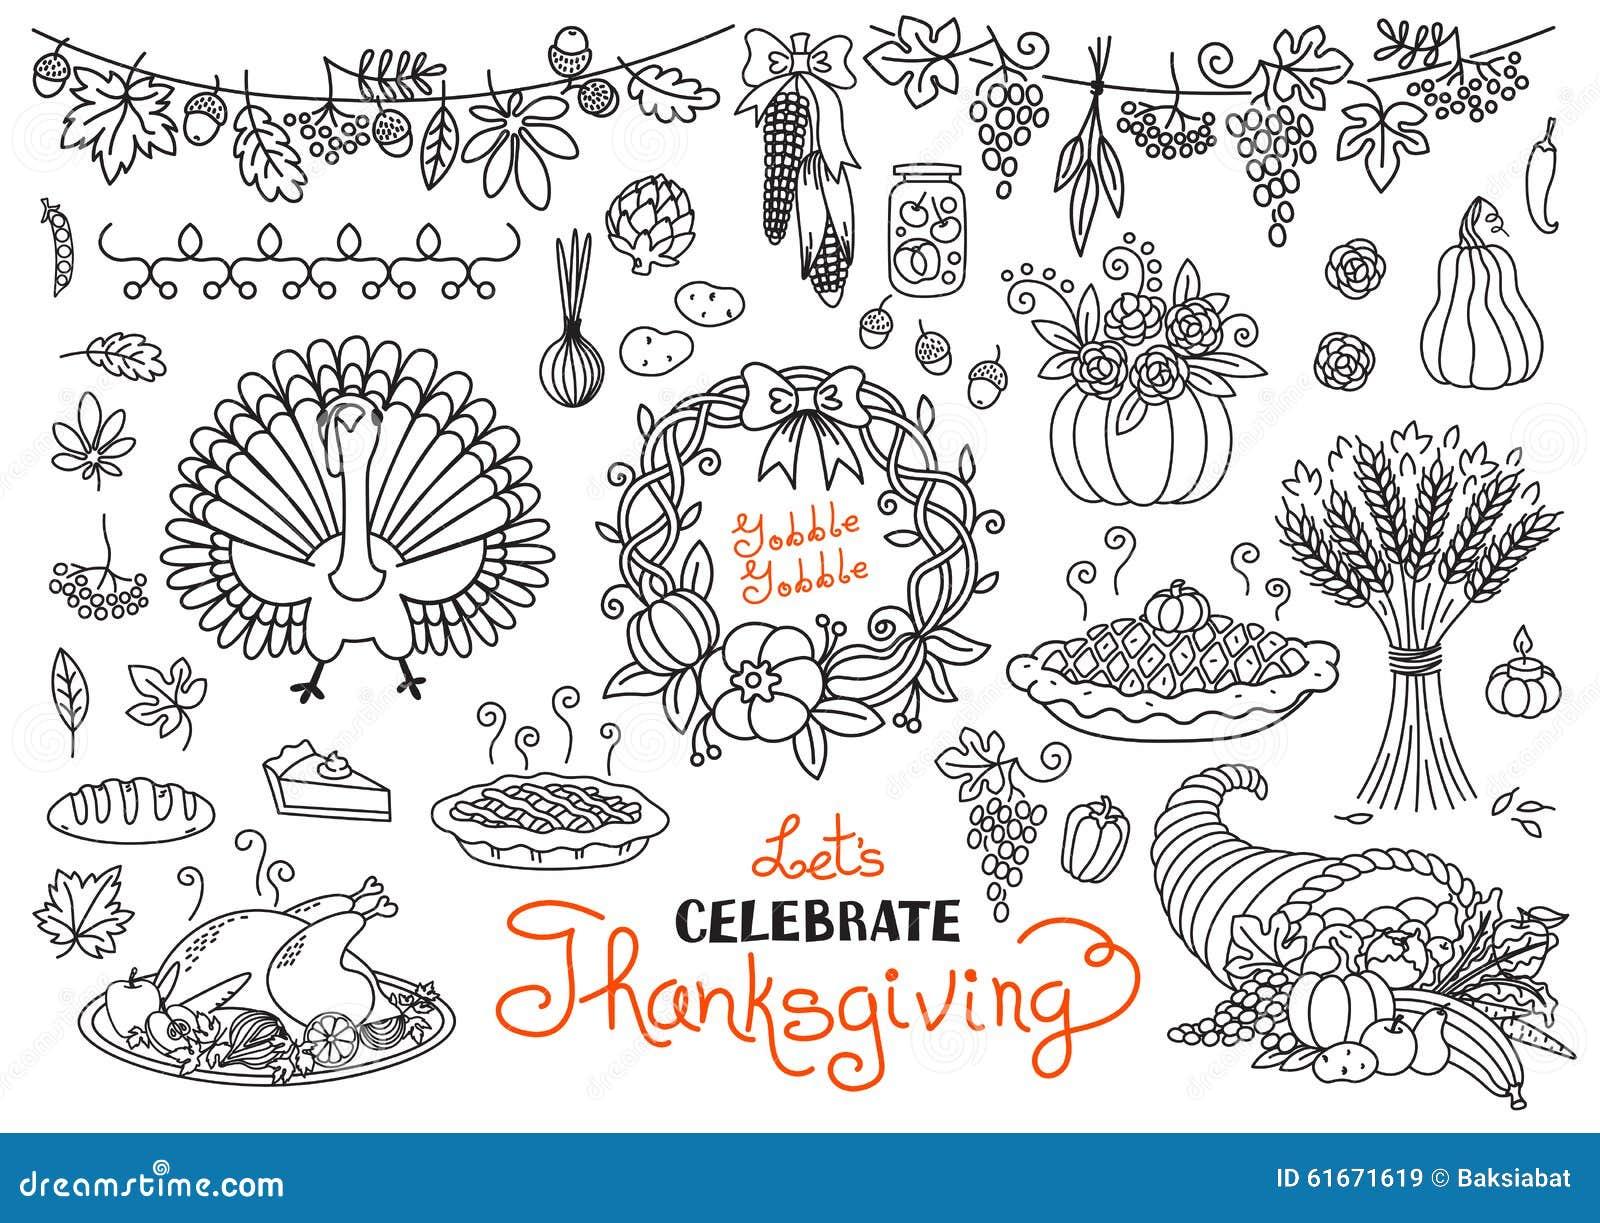 thanksgiving day doodles collection vector illustration cartoondealer com 79251288 cornucopia clipart free cornucopia clipart black and white